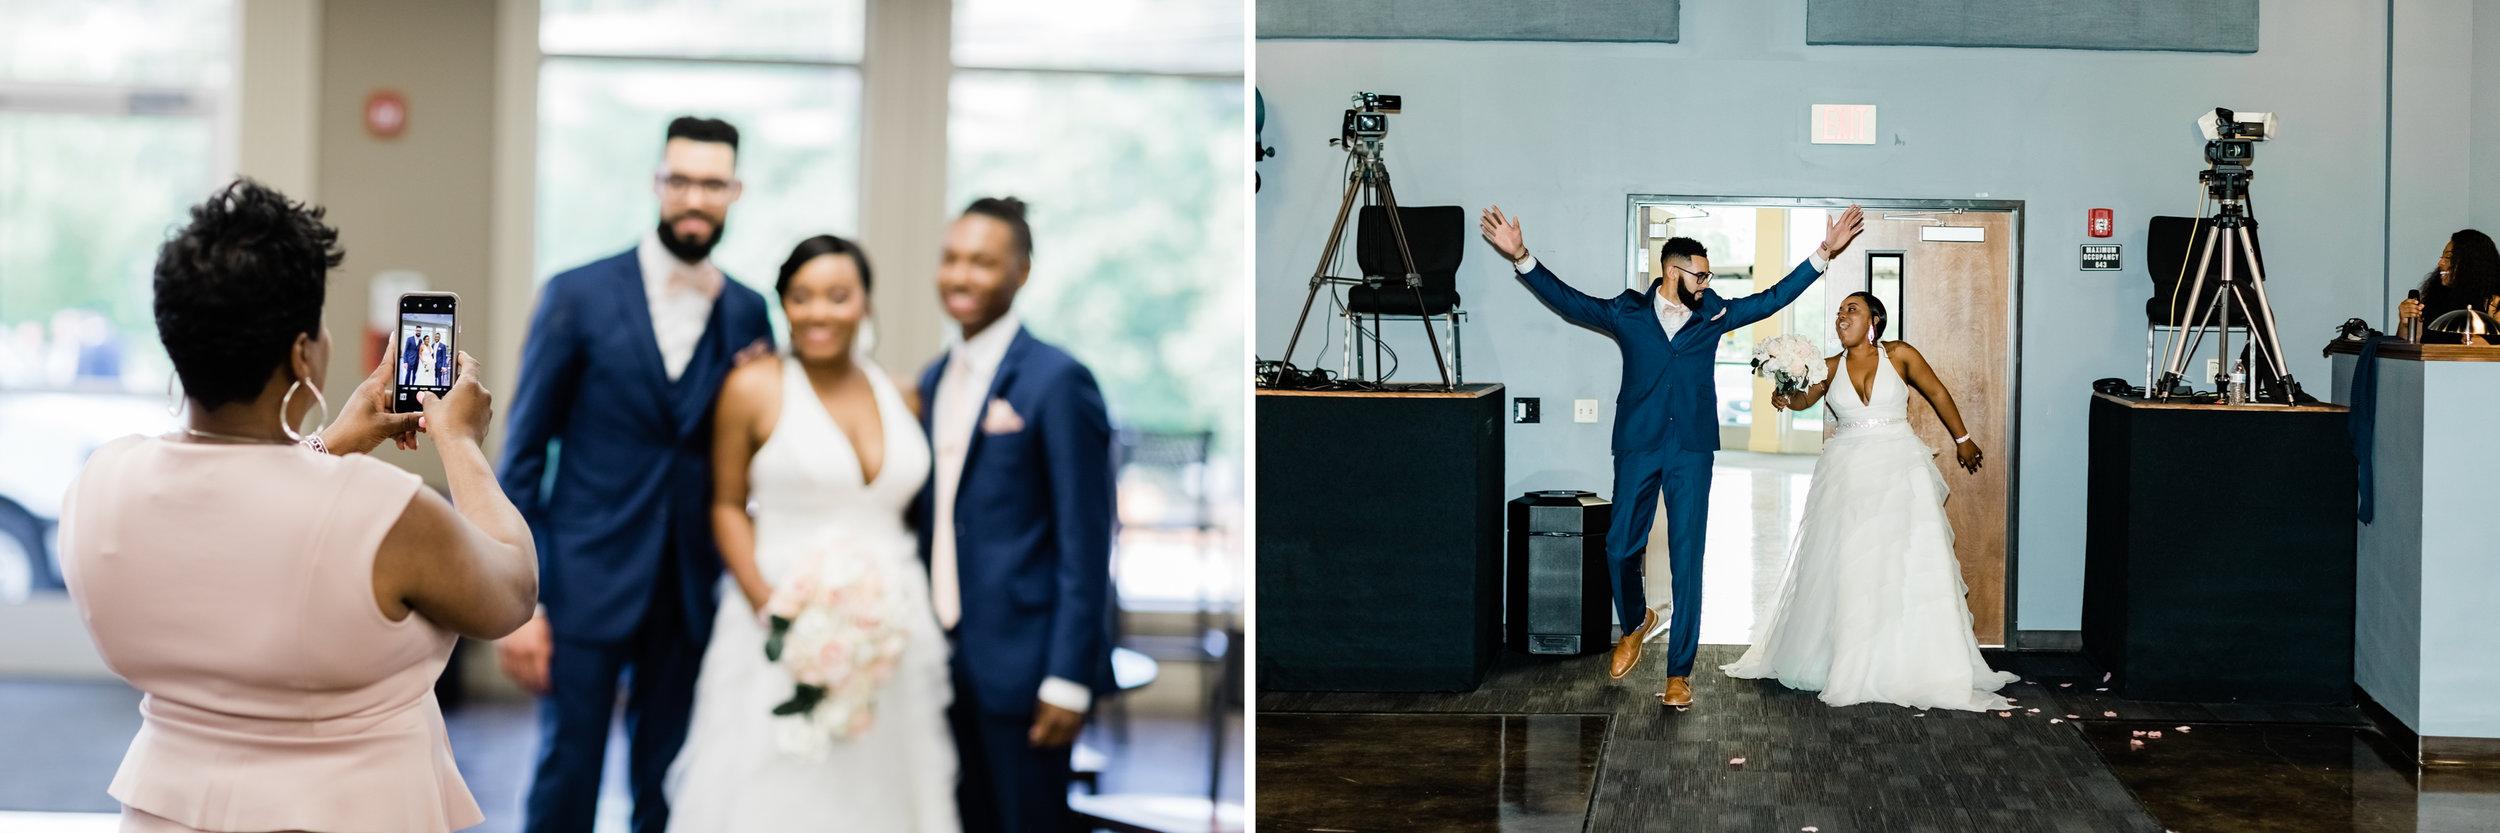 Kansas City Wedding Photographer 68.jpg